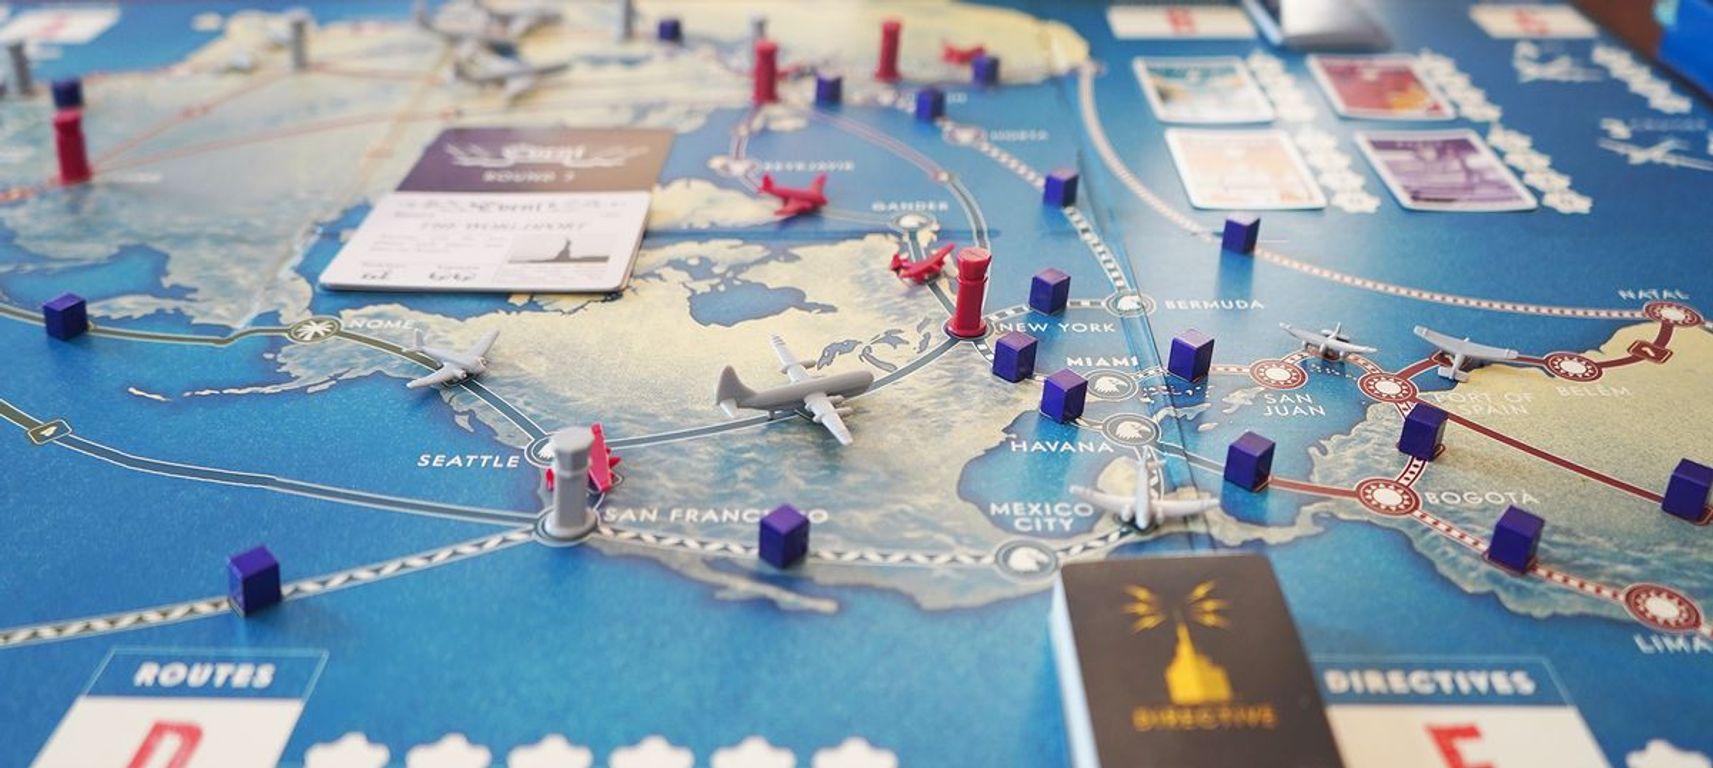 Pan Am gameplay